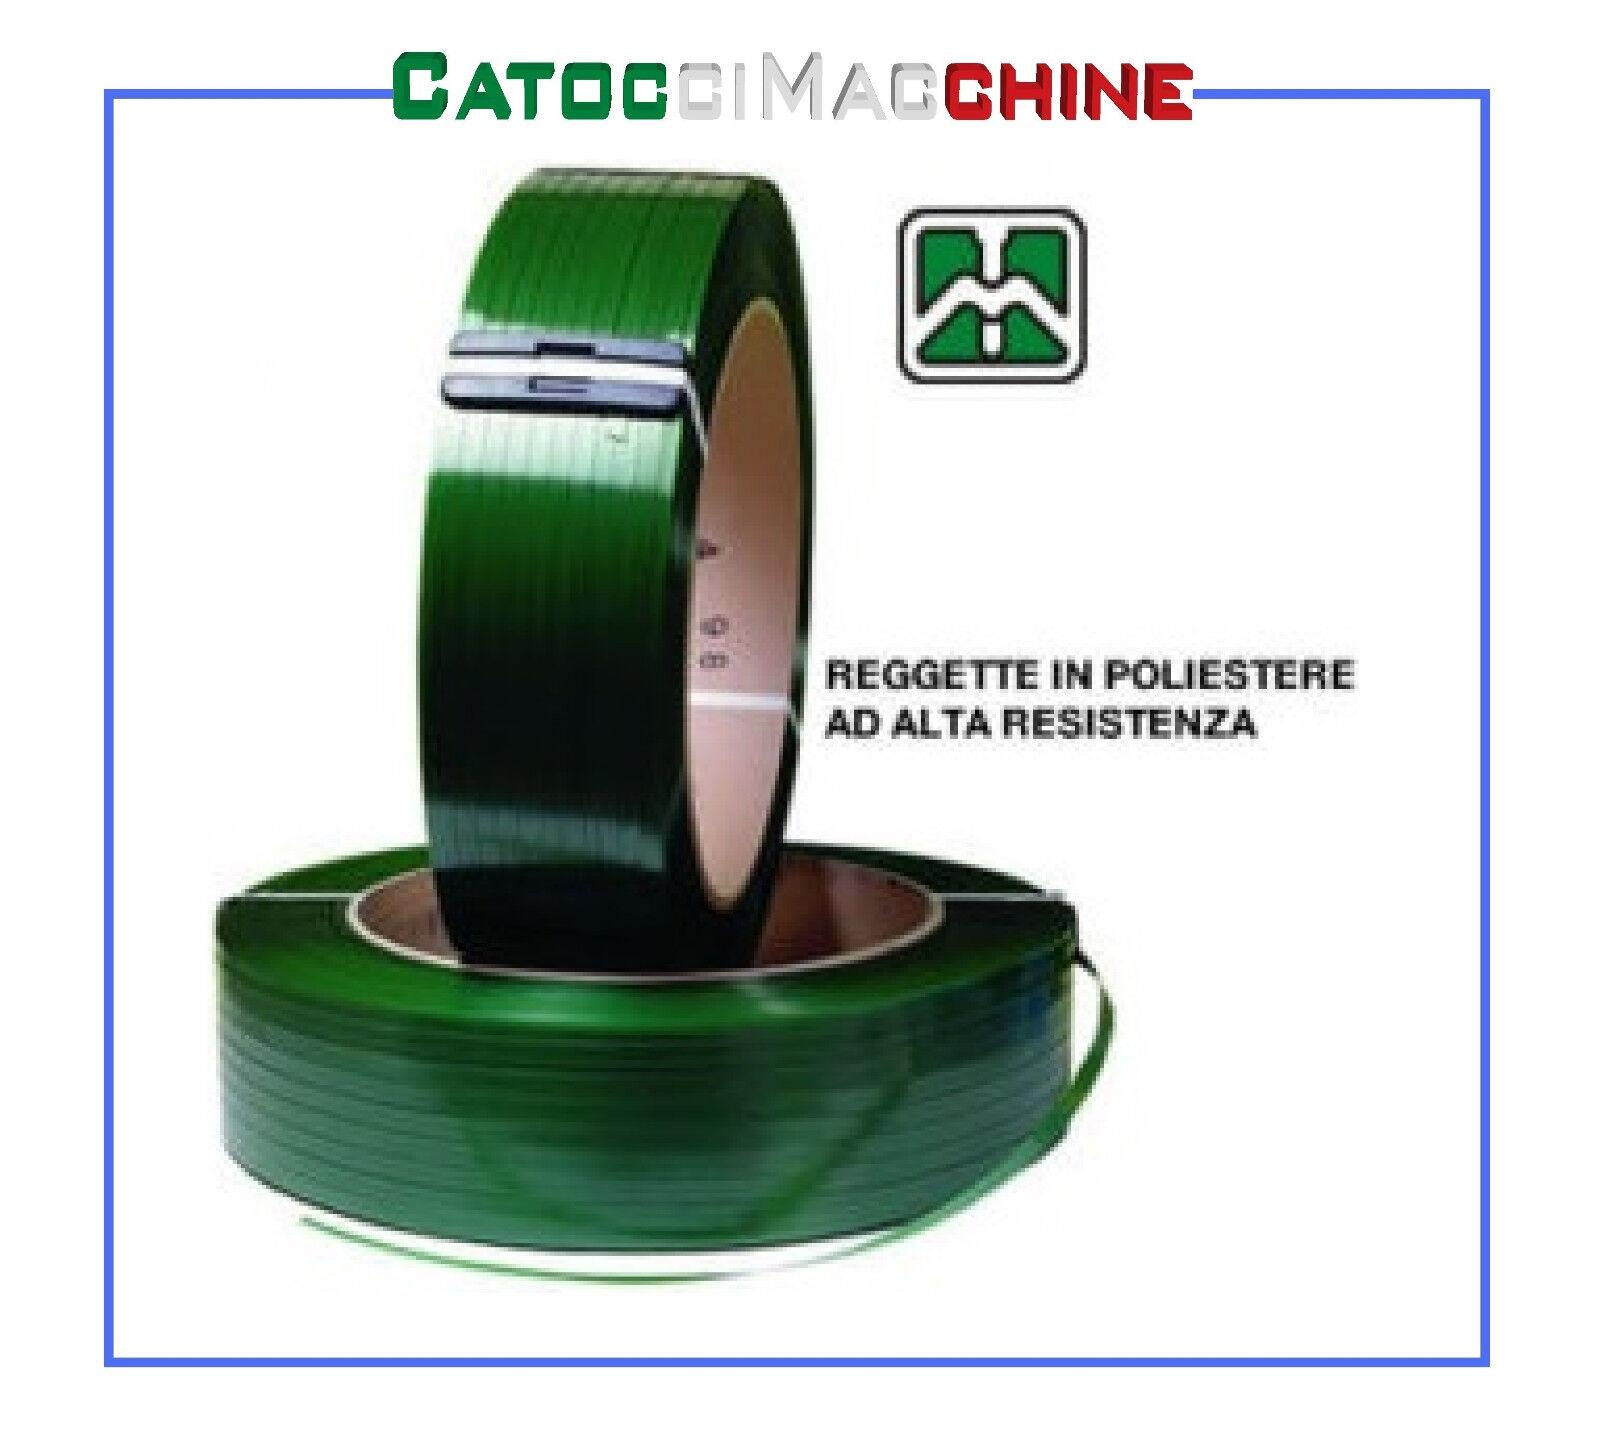 REGGIA Verde REGGETTA POLIESTERE 15 x 0,7 Verde REGGIA 1750 metri - diametro bobina 400 mm 62ee6a